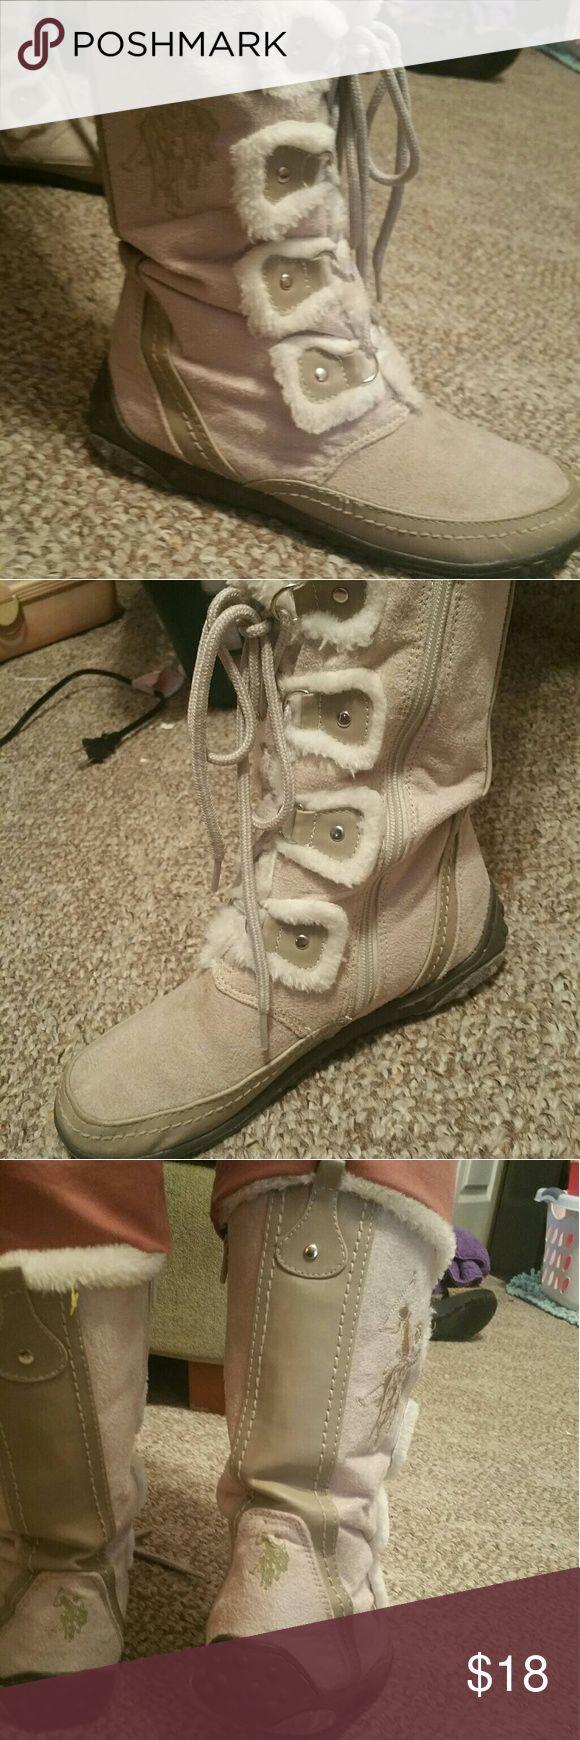 US POLO ASSOCIATION  Ralph Lauren boots Tan & beige winter tie in front zip up sides faux U.S. Polo Assn. Shoes